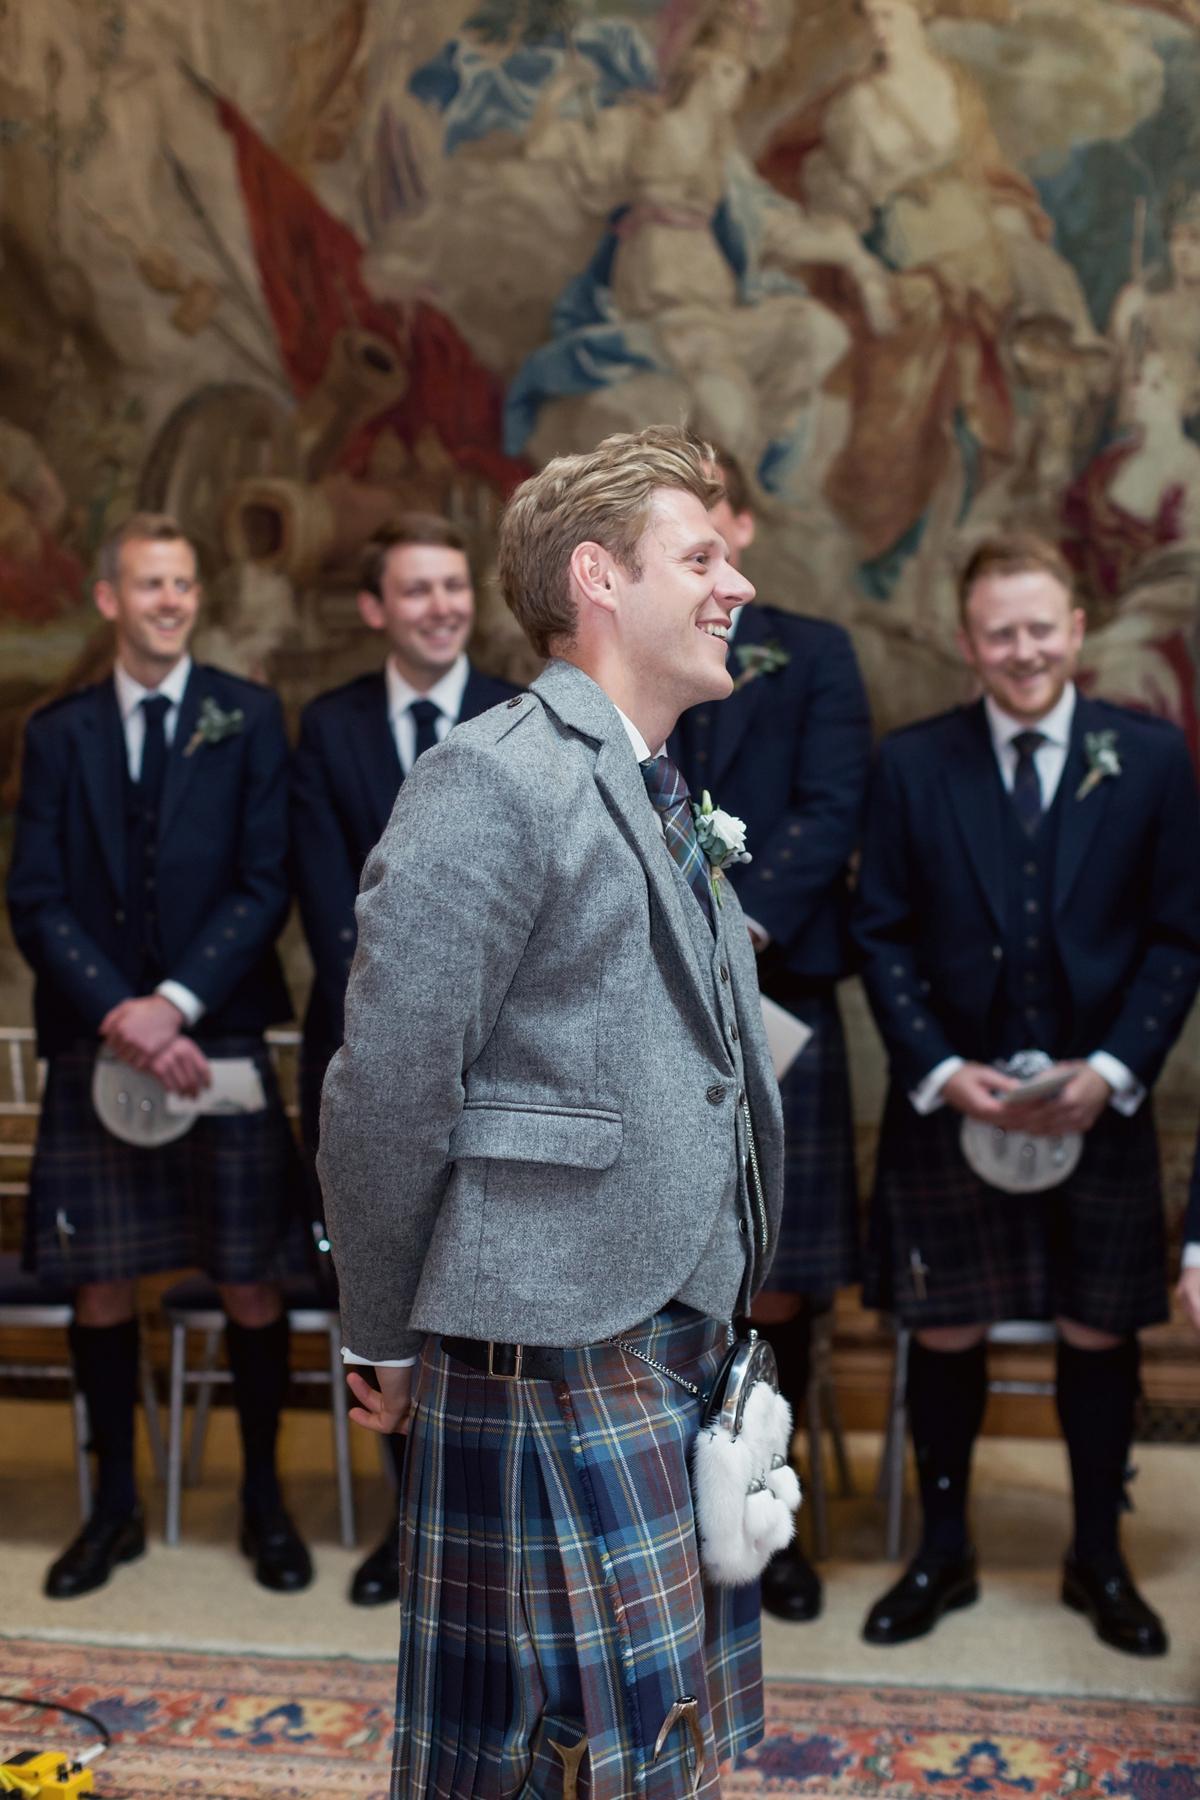 3db0685580 ... elegant beautiful scottish wedding - An Elegant Scottish Wedding  Inspired by Nature